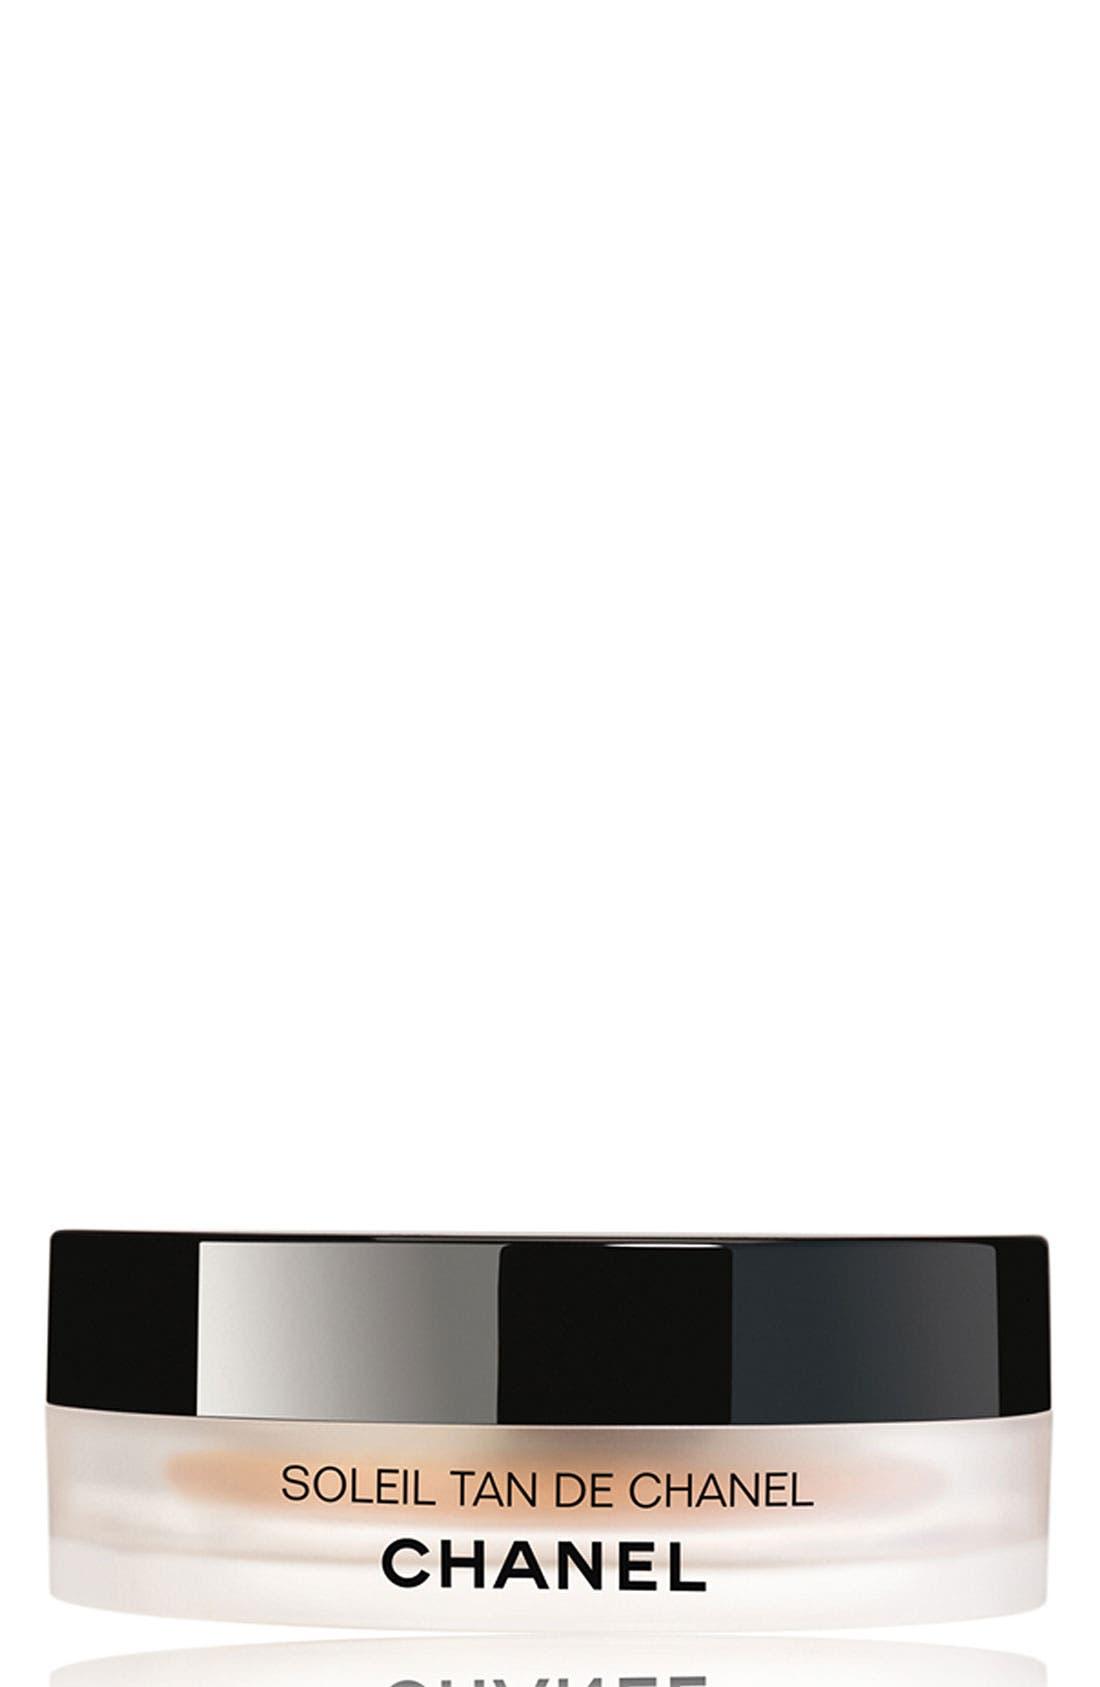 CHANEL, SOLEIL TAN DE CHANEL<br />Bronzing Makeup Base, Alternate thumbnail 3, color, 30 BRONZING